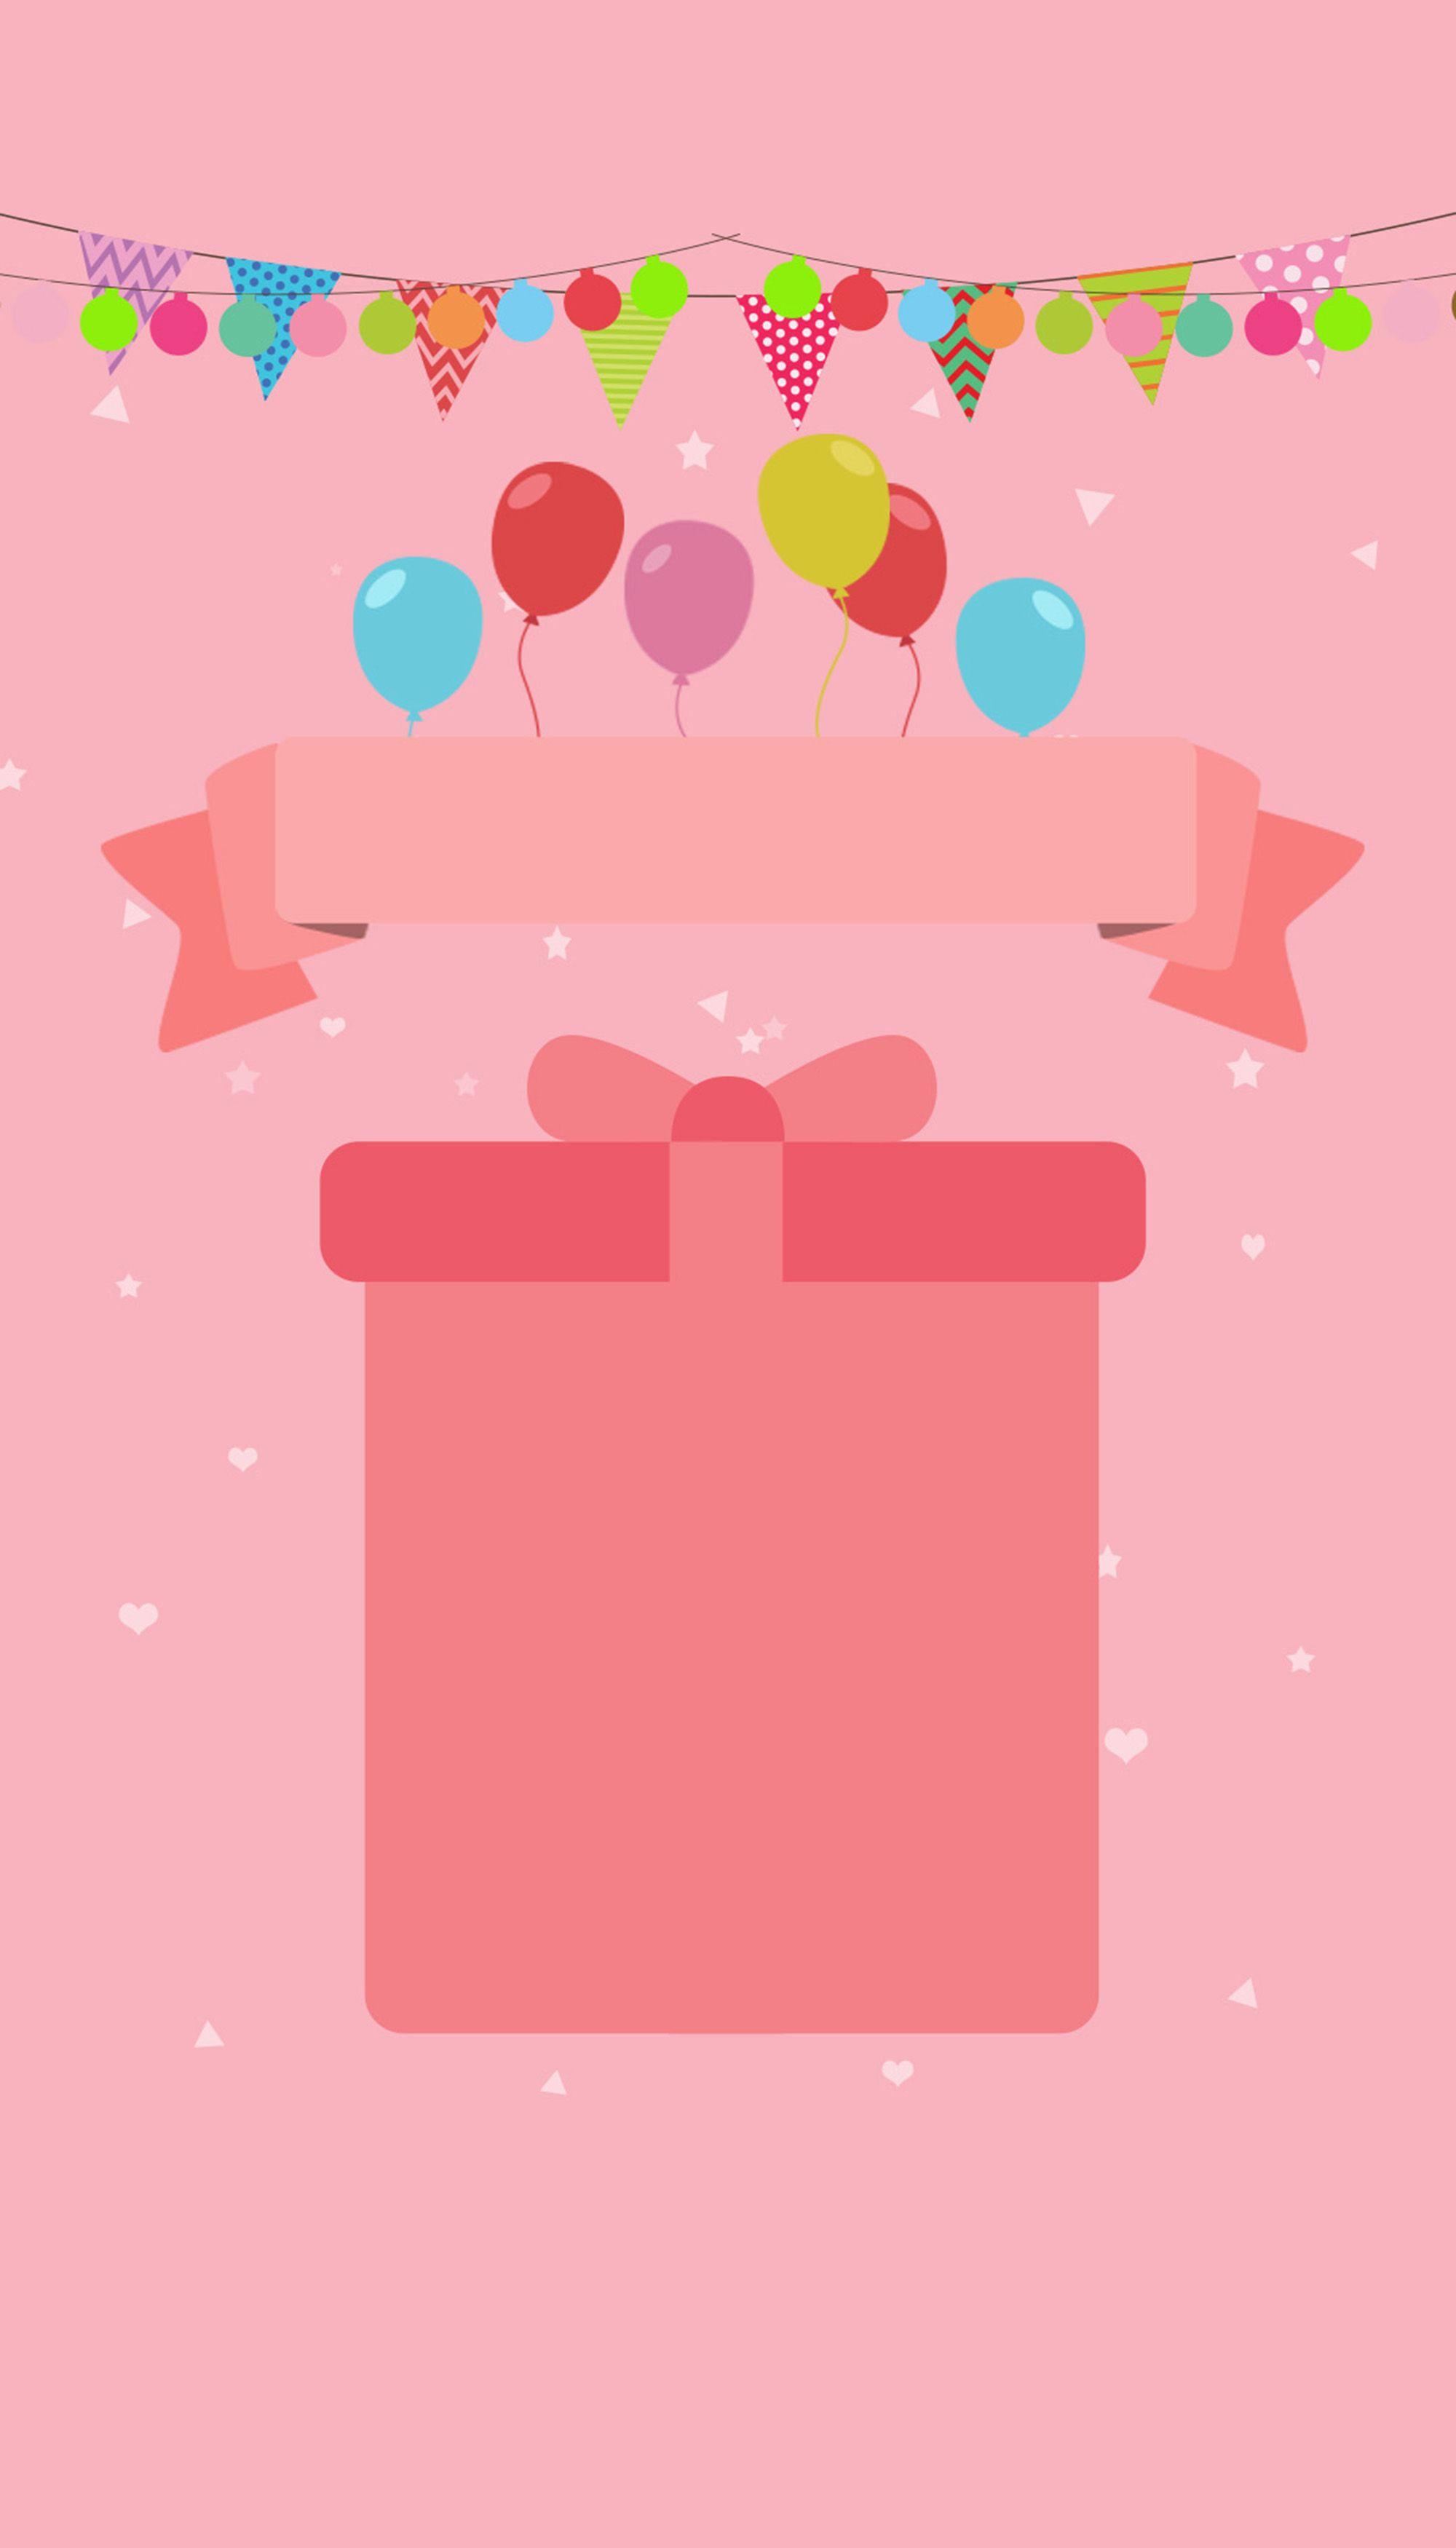 Card Design Pink Cartoon Background Happy Birthday Wallpaper Cartoon Background Card Design